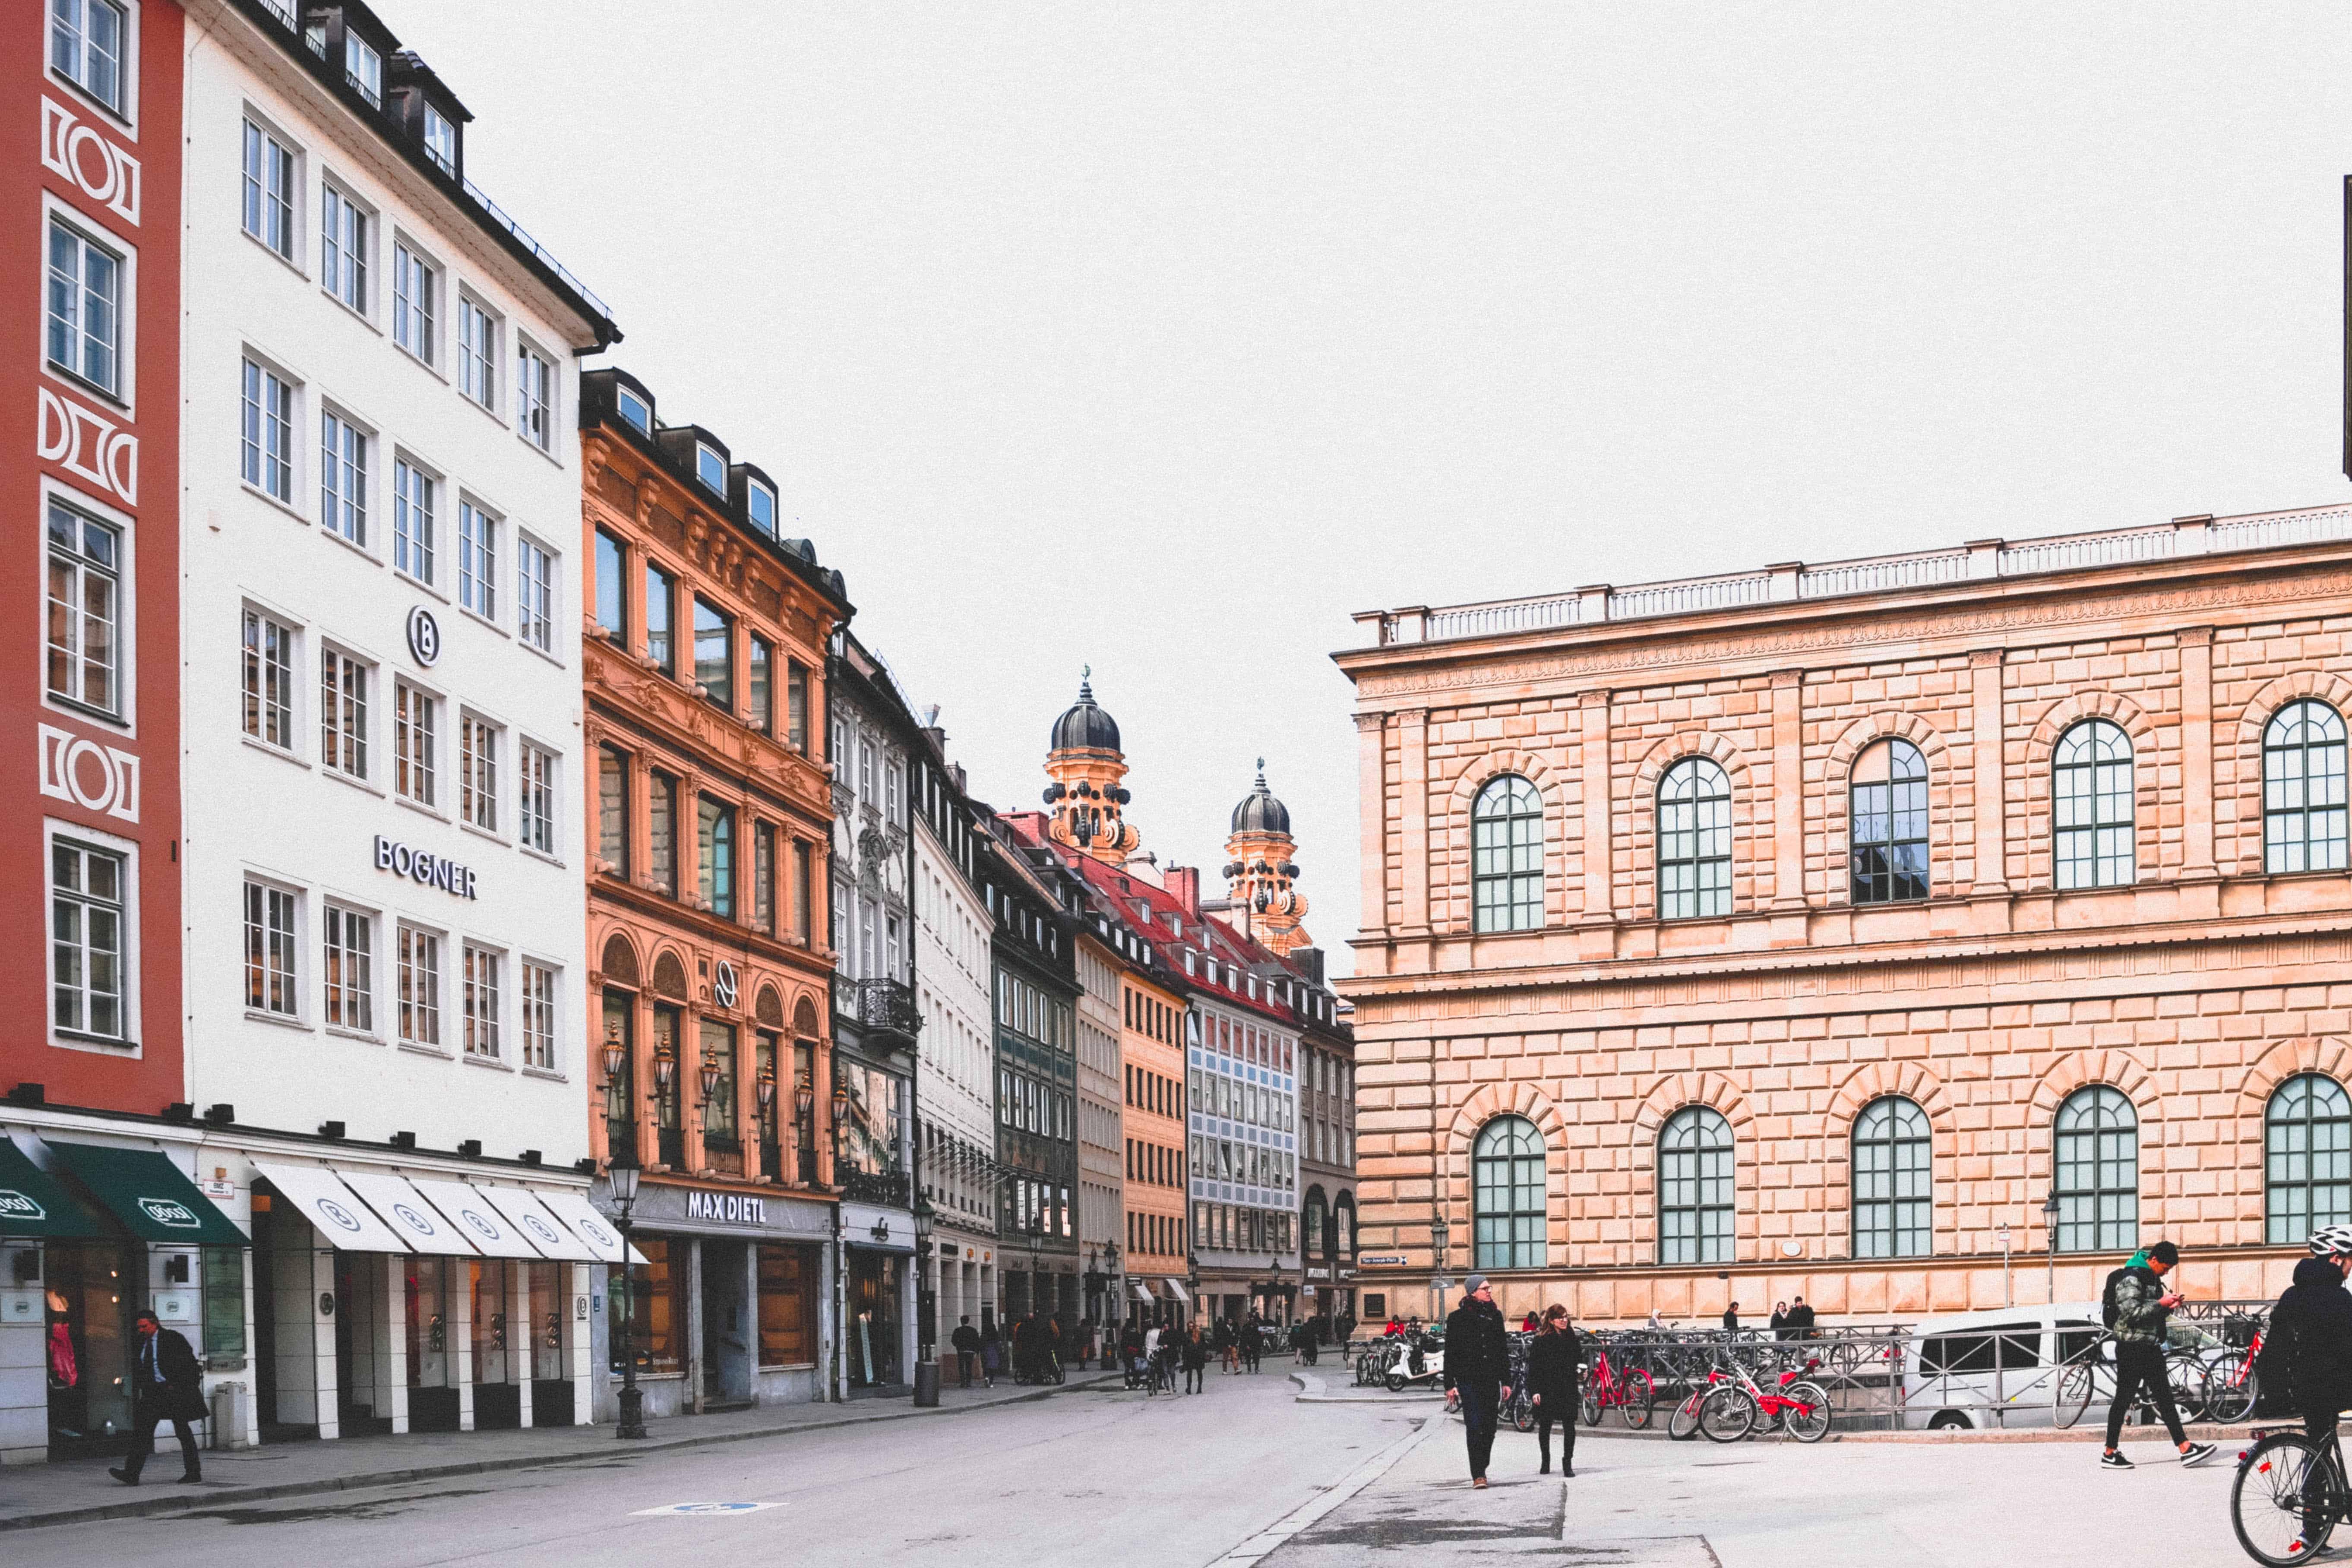 münchen größte projektentwickler bauträger liste